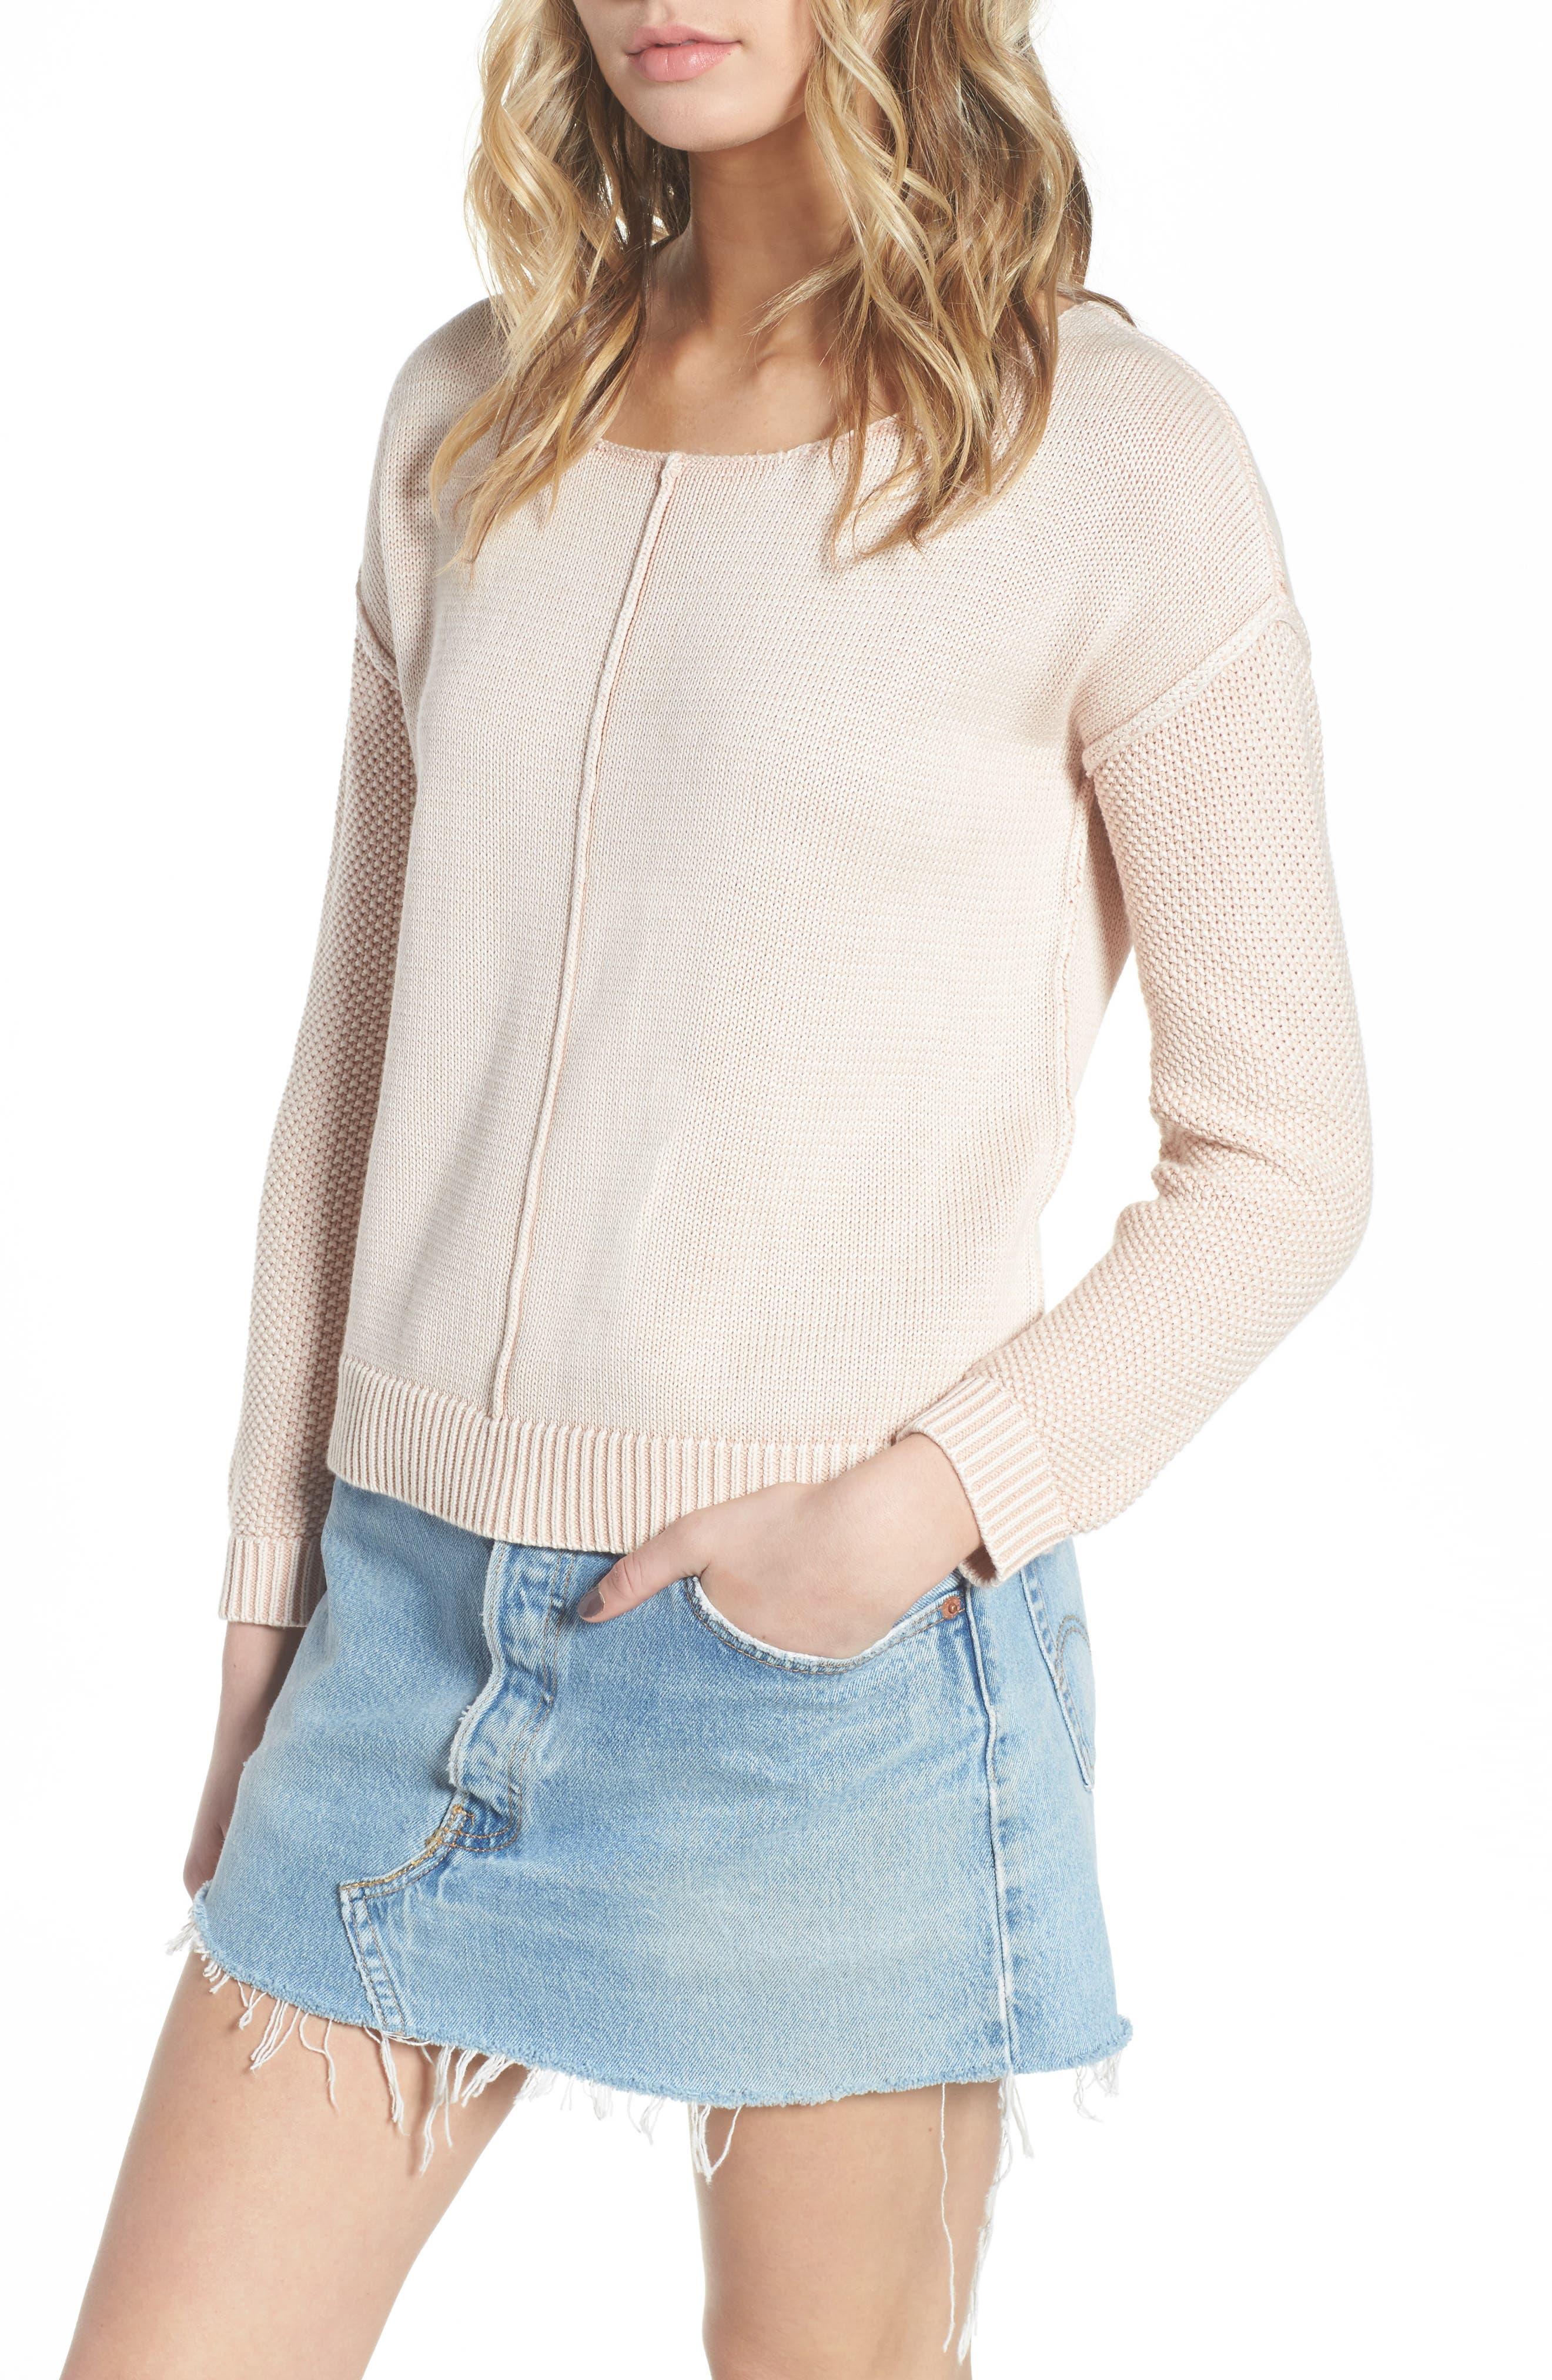 Erin Knit Sweater,                             Main thumbnail 1, color,                             Sand Washed Blush